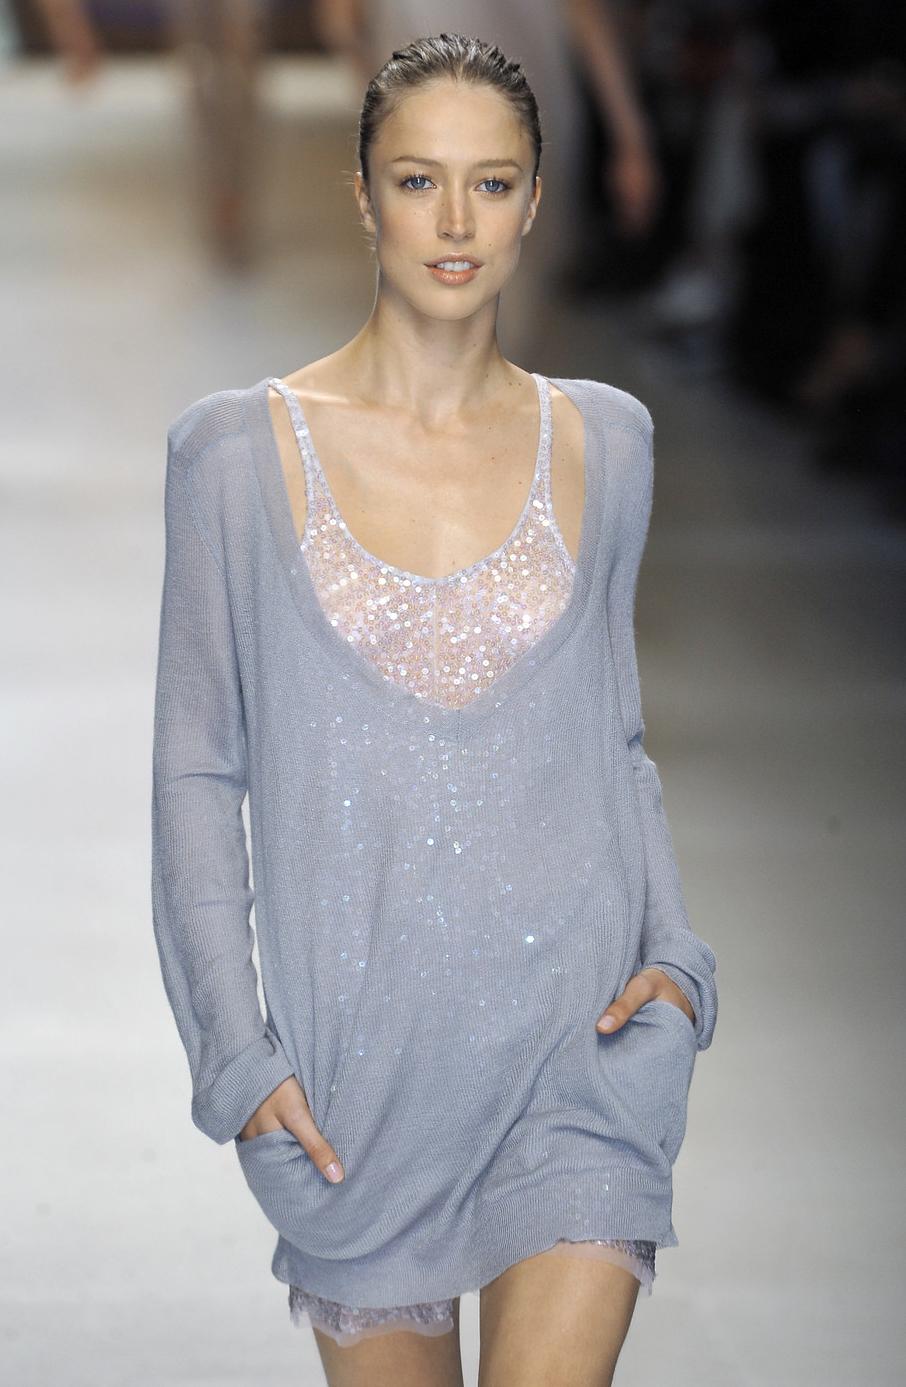 Stella McCartney Spring/Summer 2009 via fashioned by love british fashion blog